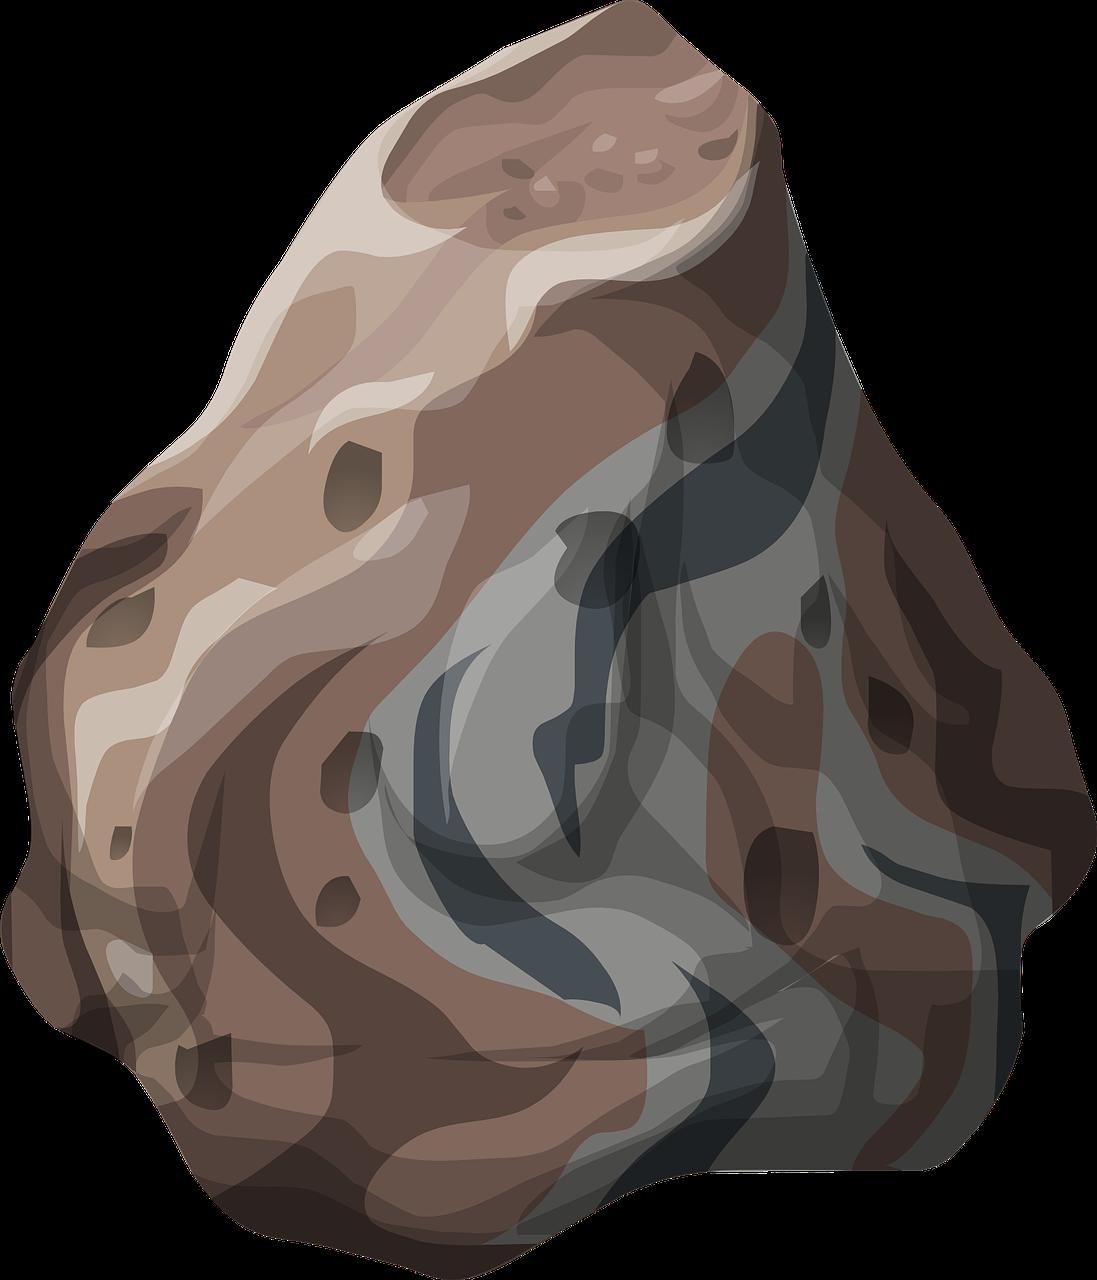 Boulder clipart underwater. Stone rock solid heavy